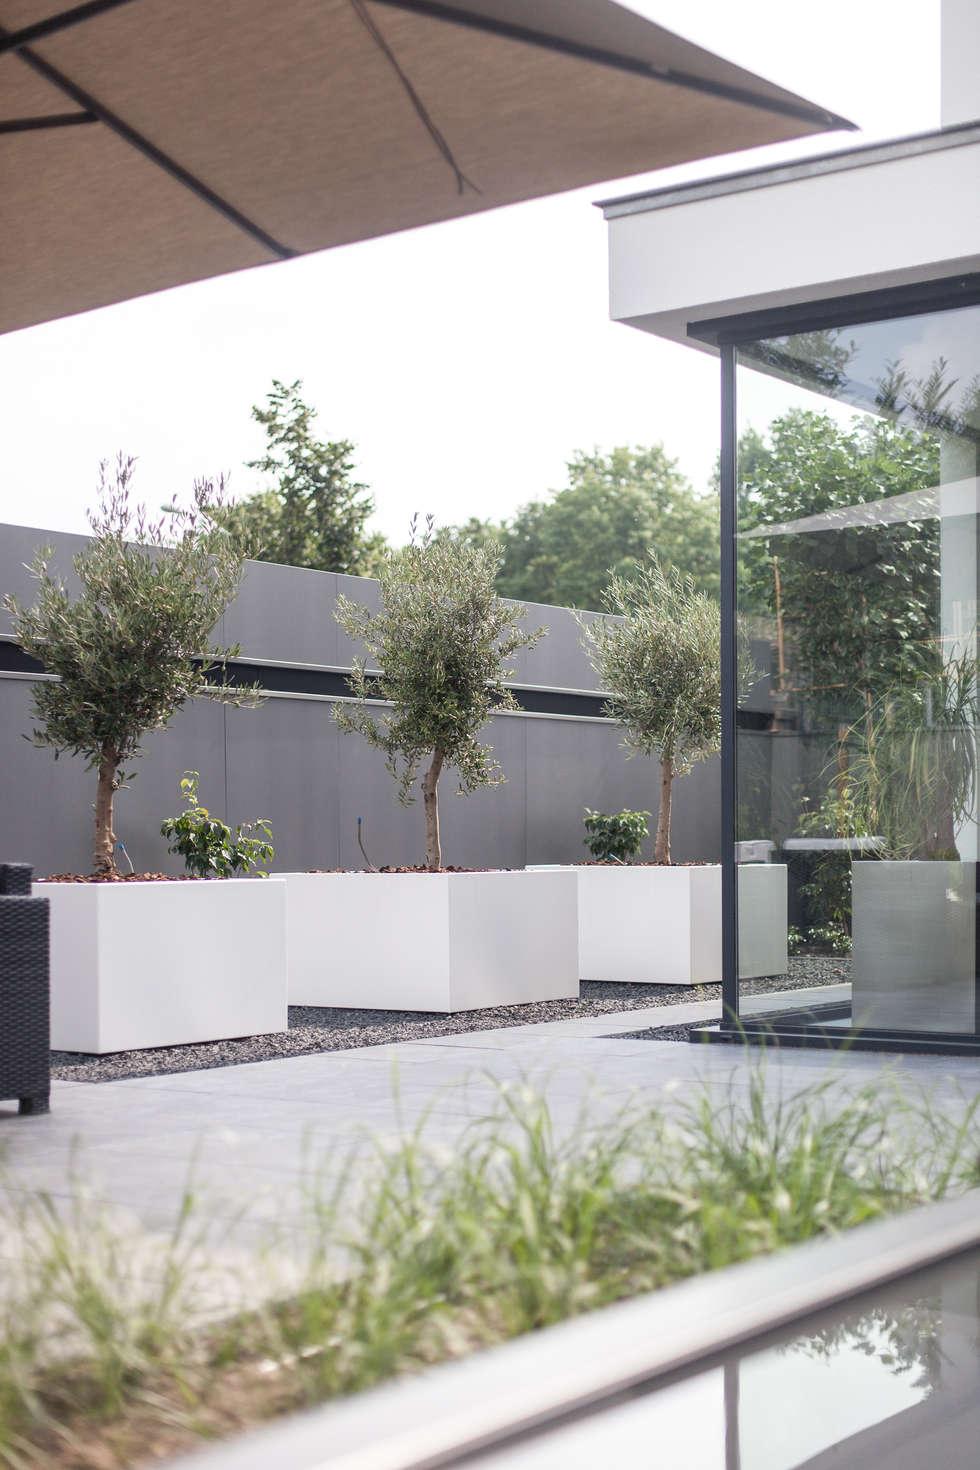 Tuinkamer - modern: moderne Serre door Bob Romijnders Architectuur & Interieur